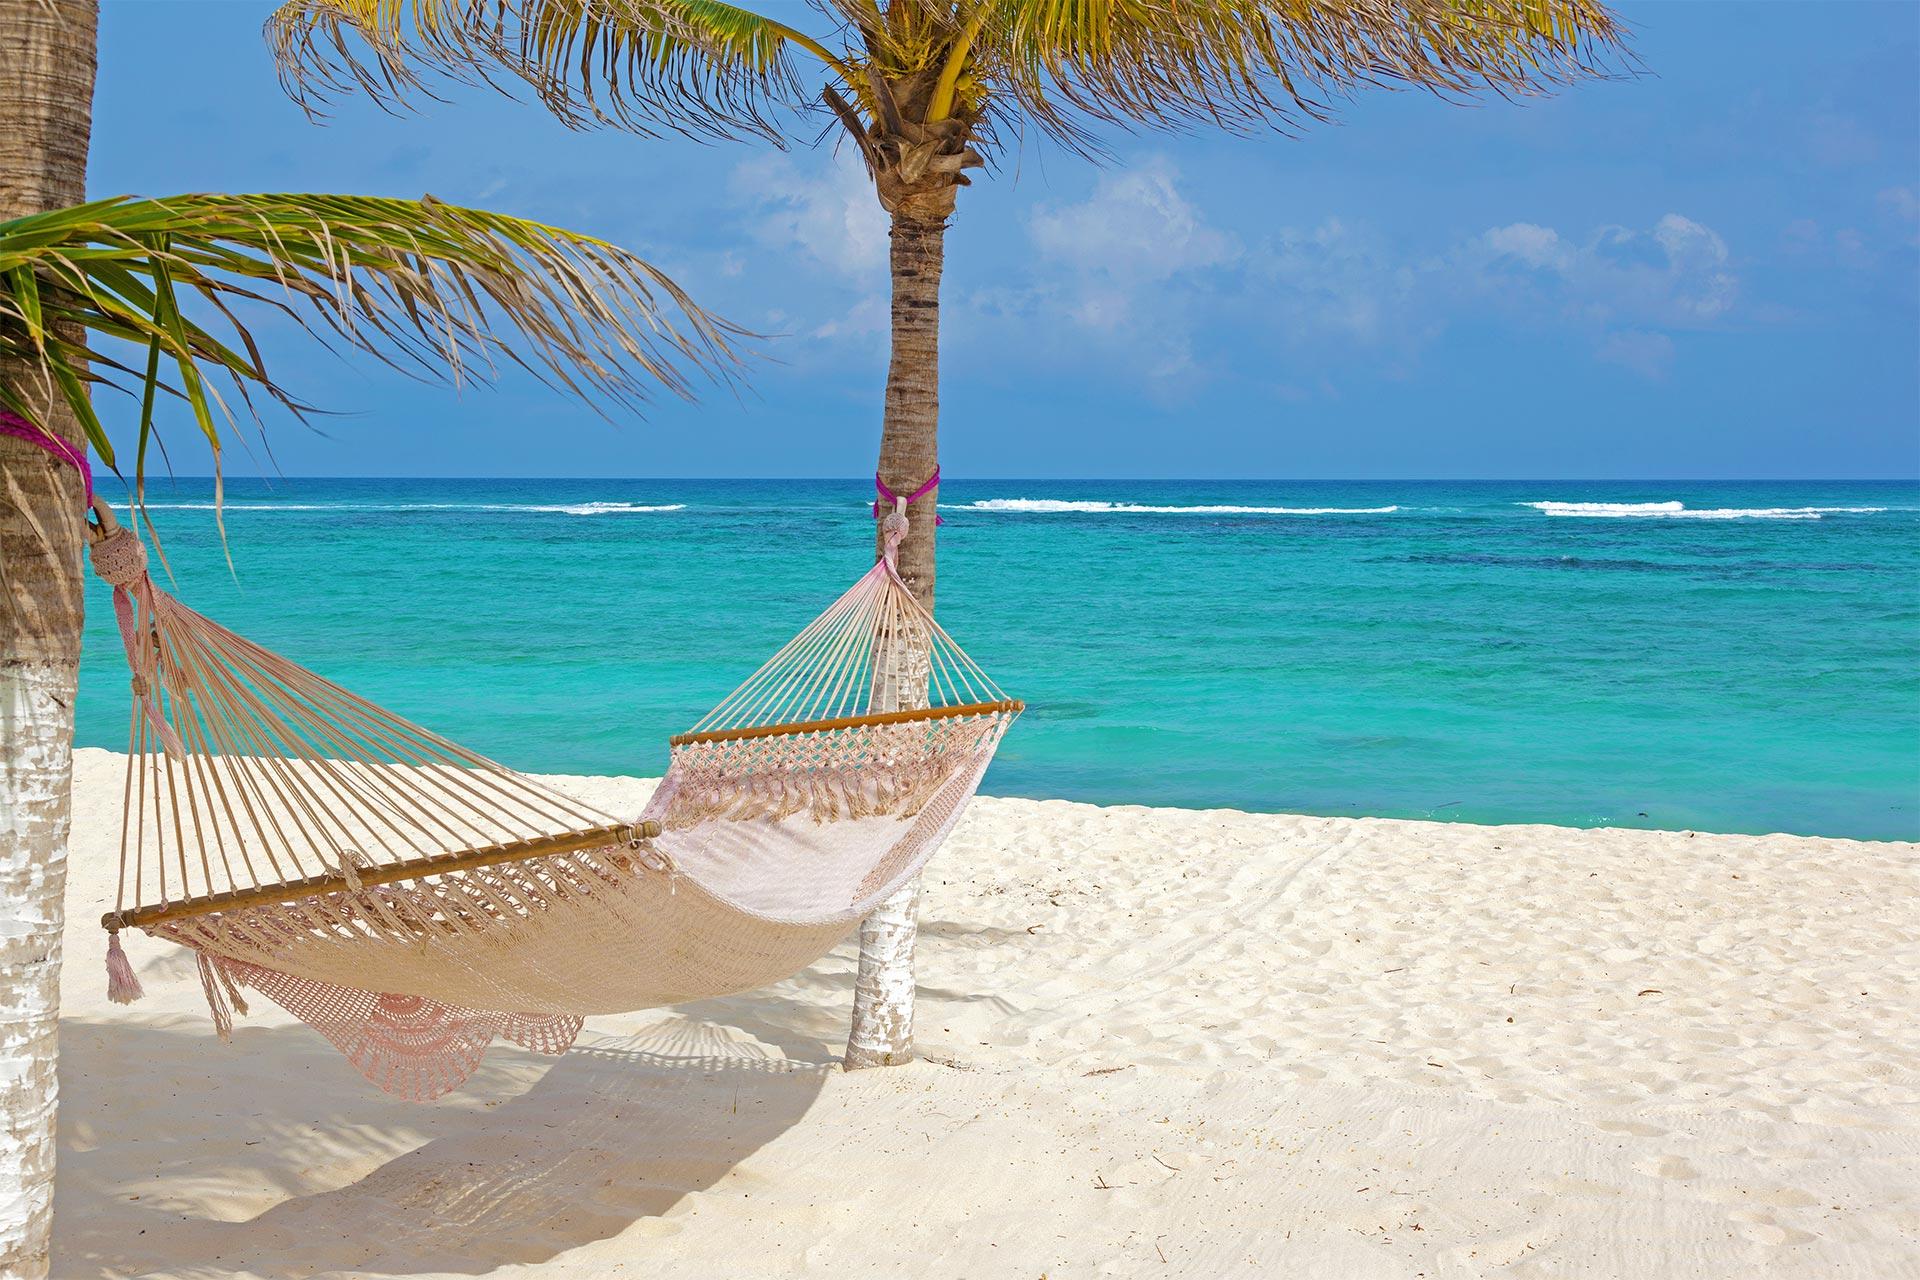 Sejur plaja Riviera Maya, Mexic, 11 zile - noiembrie 2021